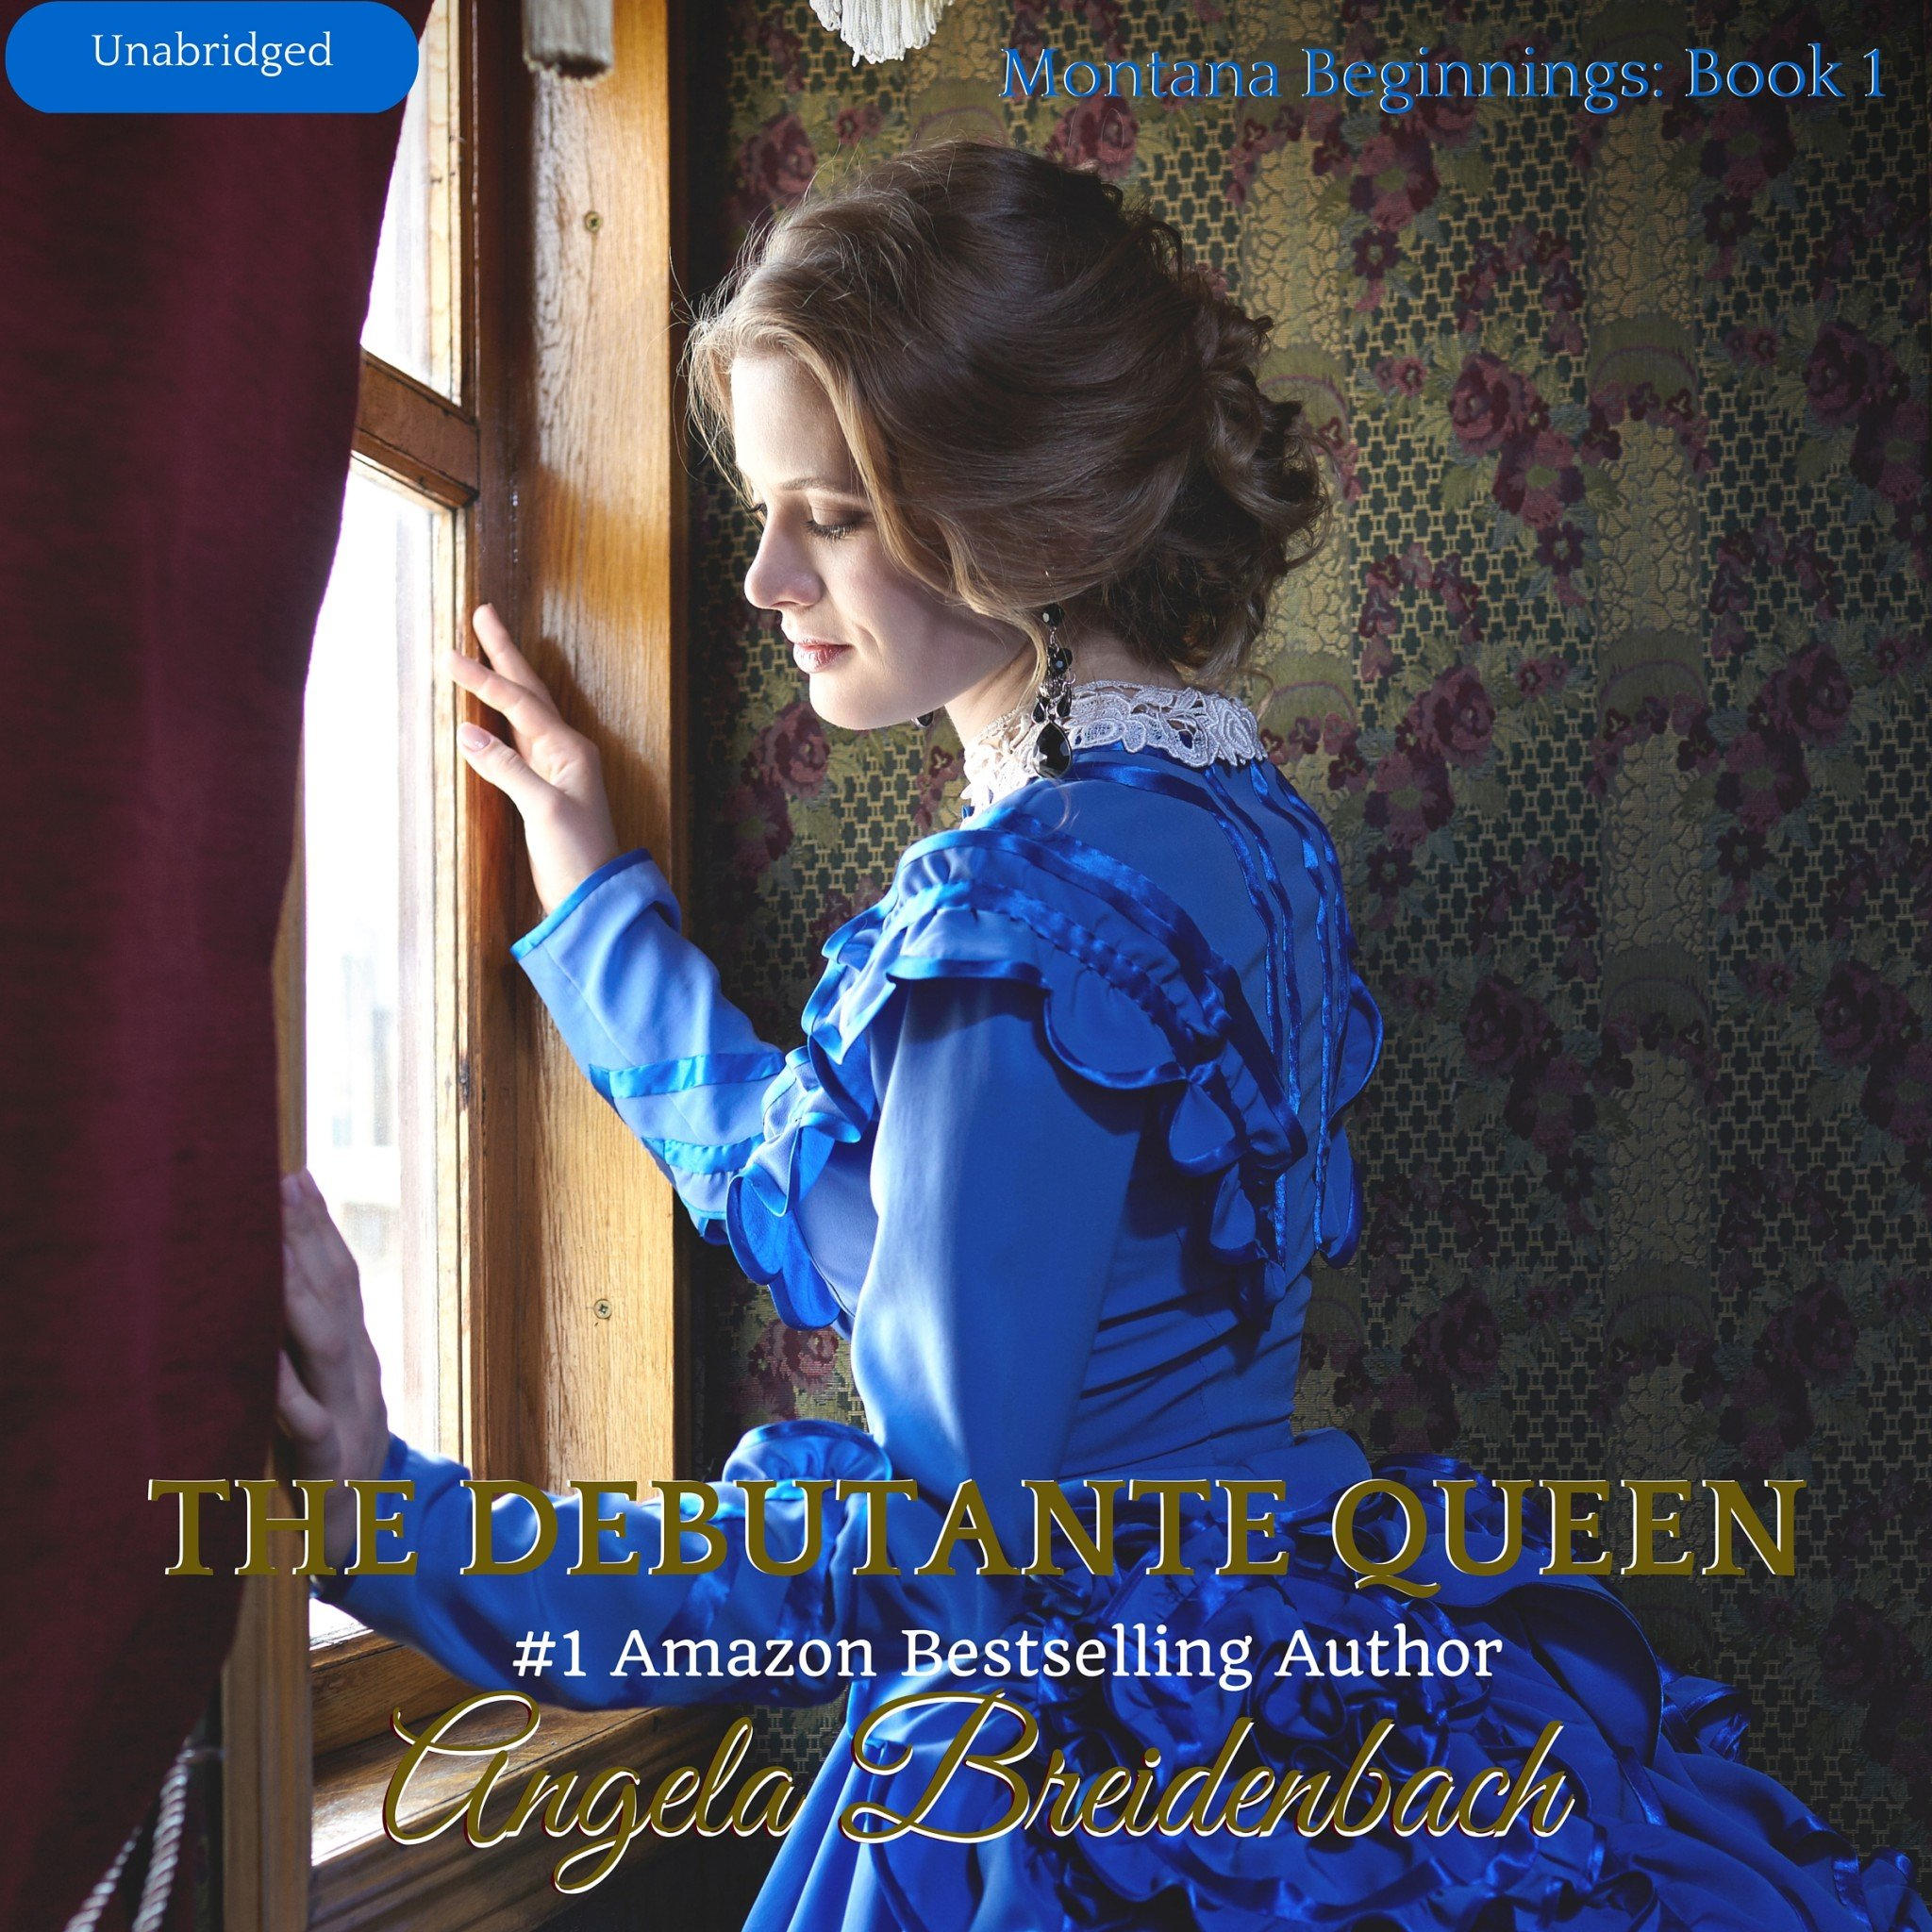 The Debutante Queen (Audiobook) by Angela Breidenbach